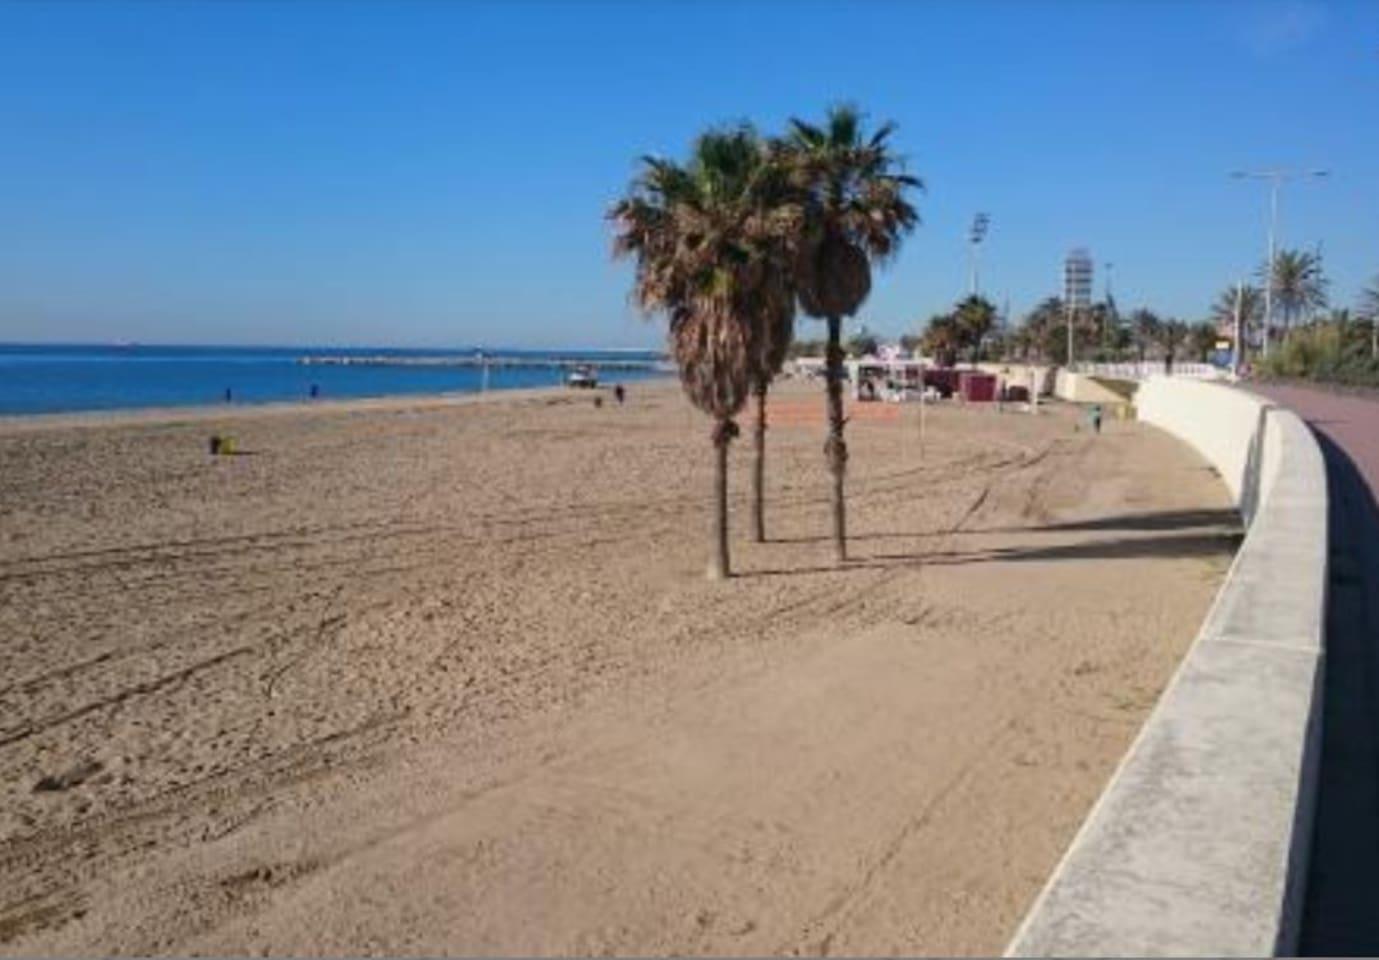 1/19 Playa Marbella a 2 minutos de casa / Marbella beach 2 minutes walk from home